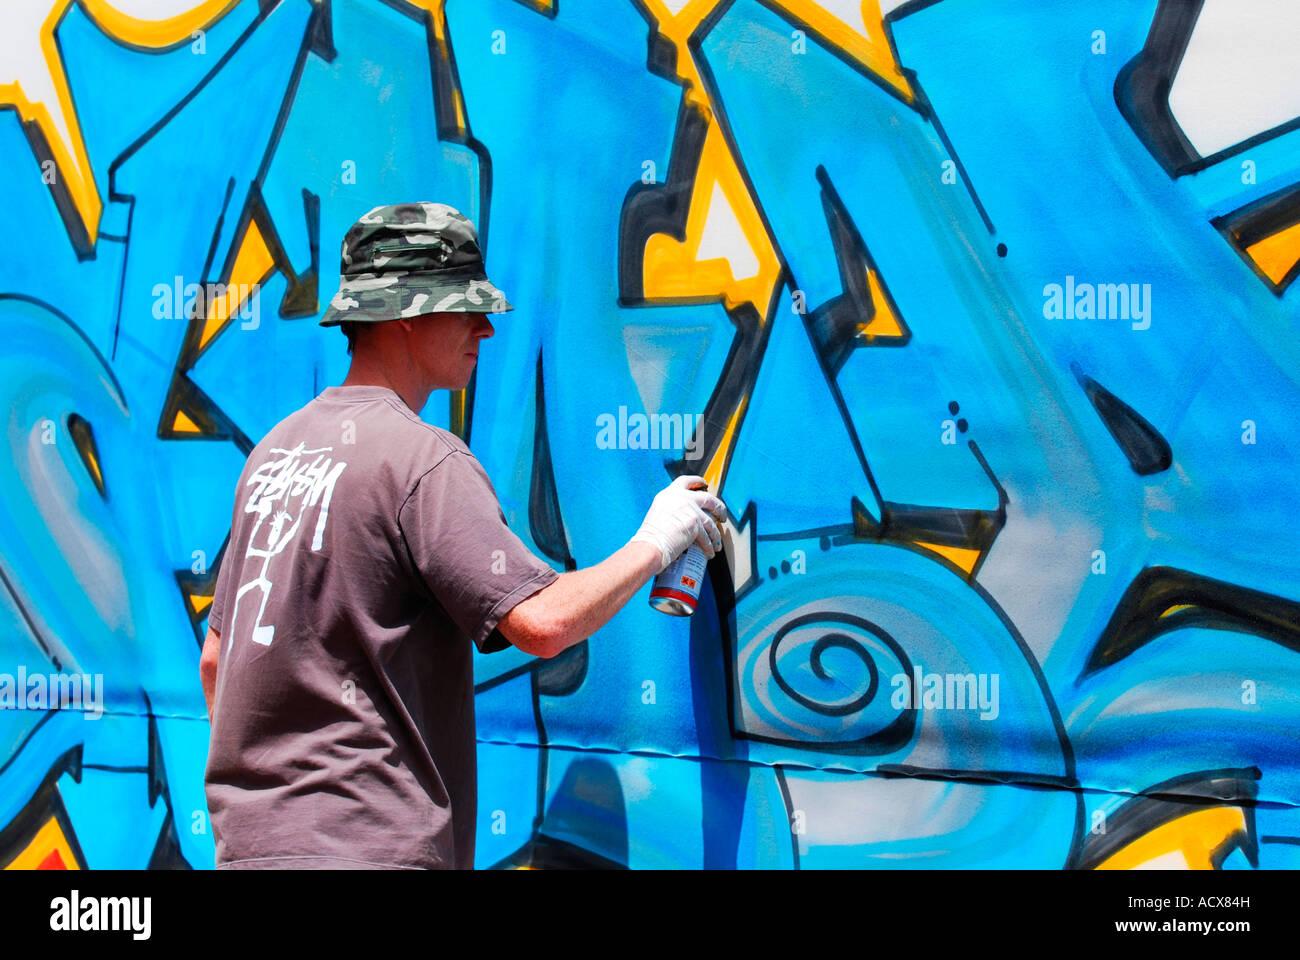 Spray Paint Graffiti Artist